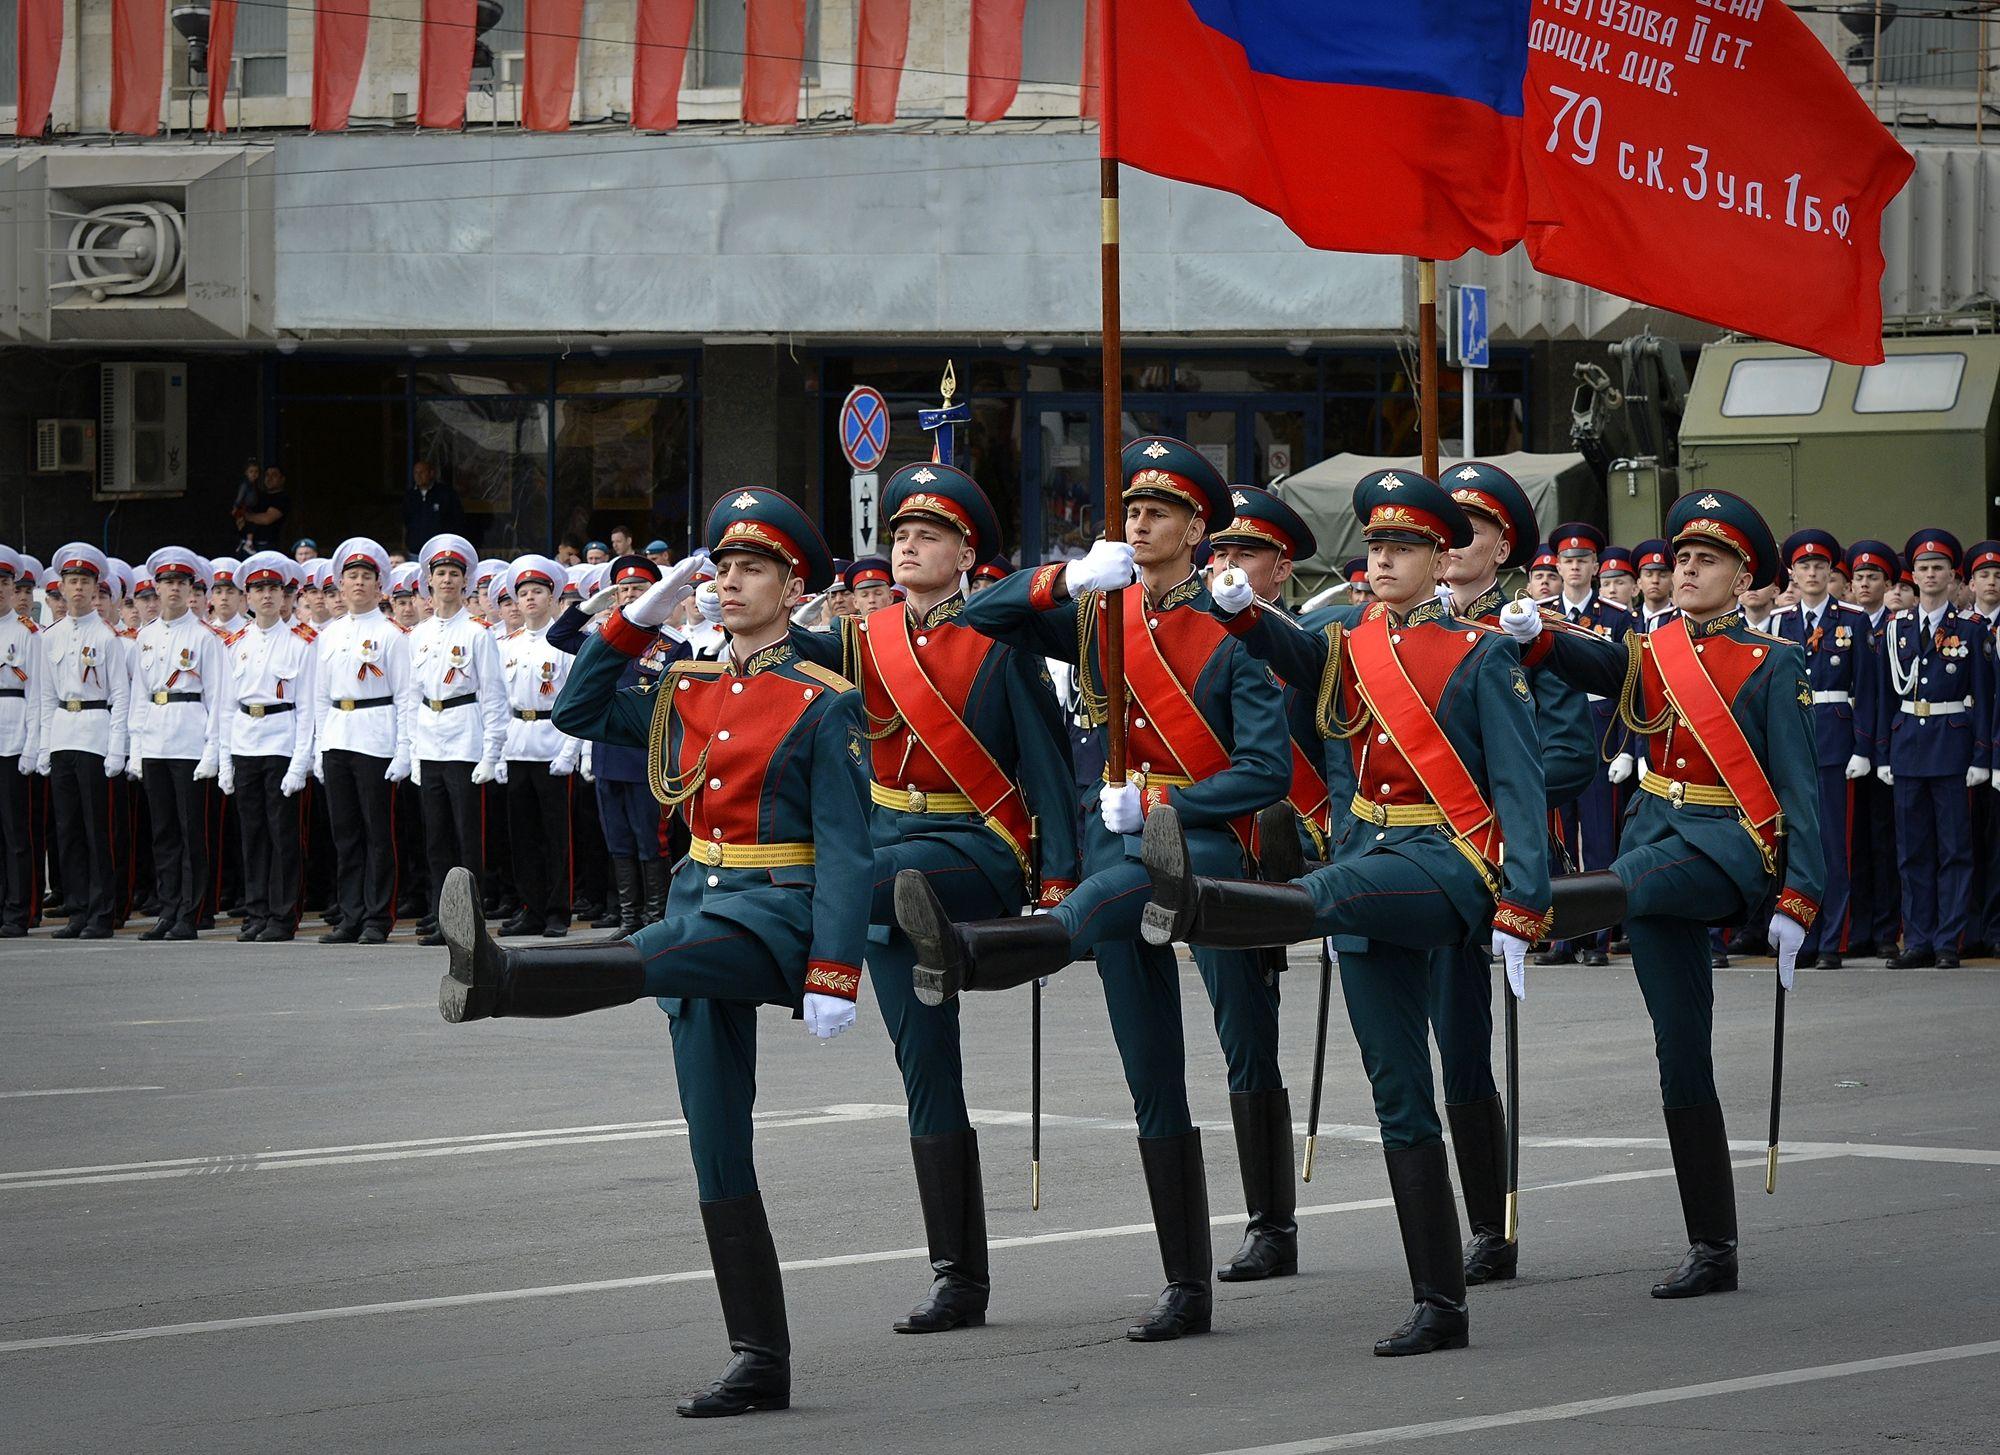 изготавливают картинка военный марш мужчин